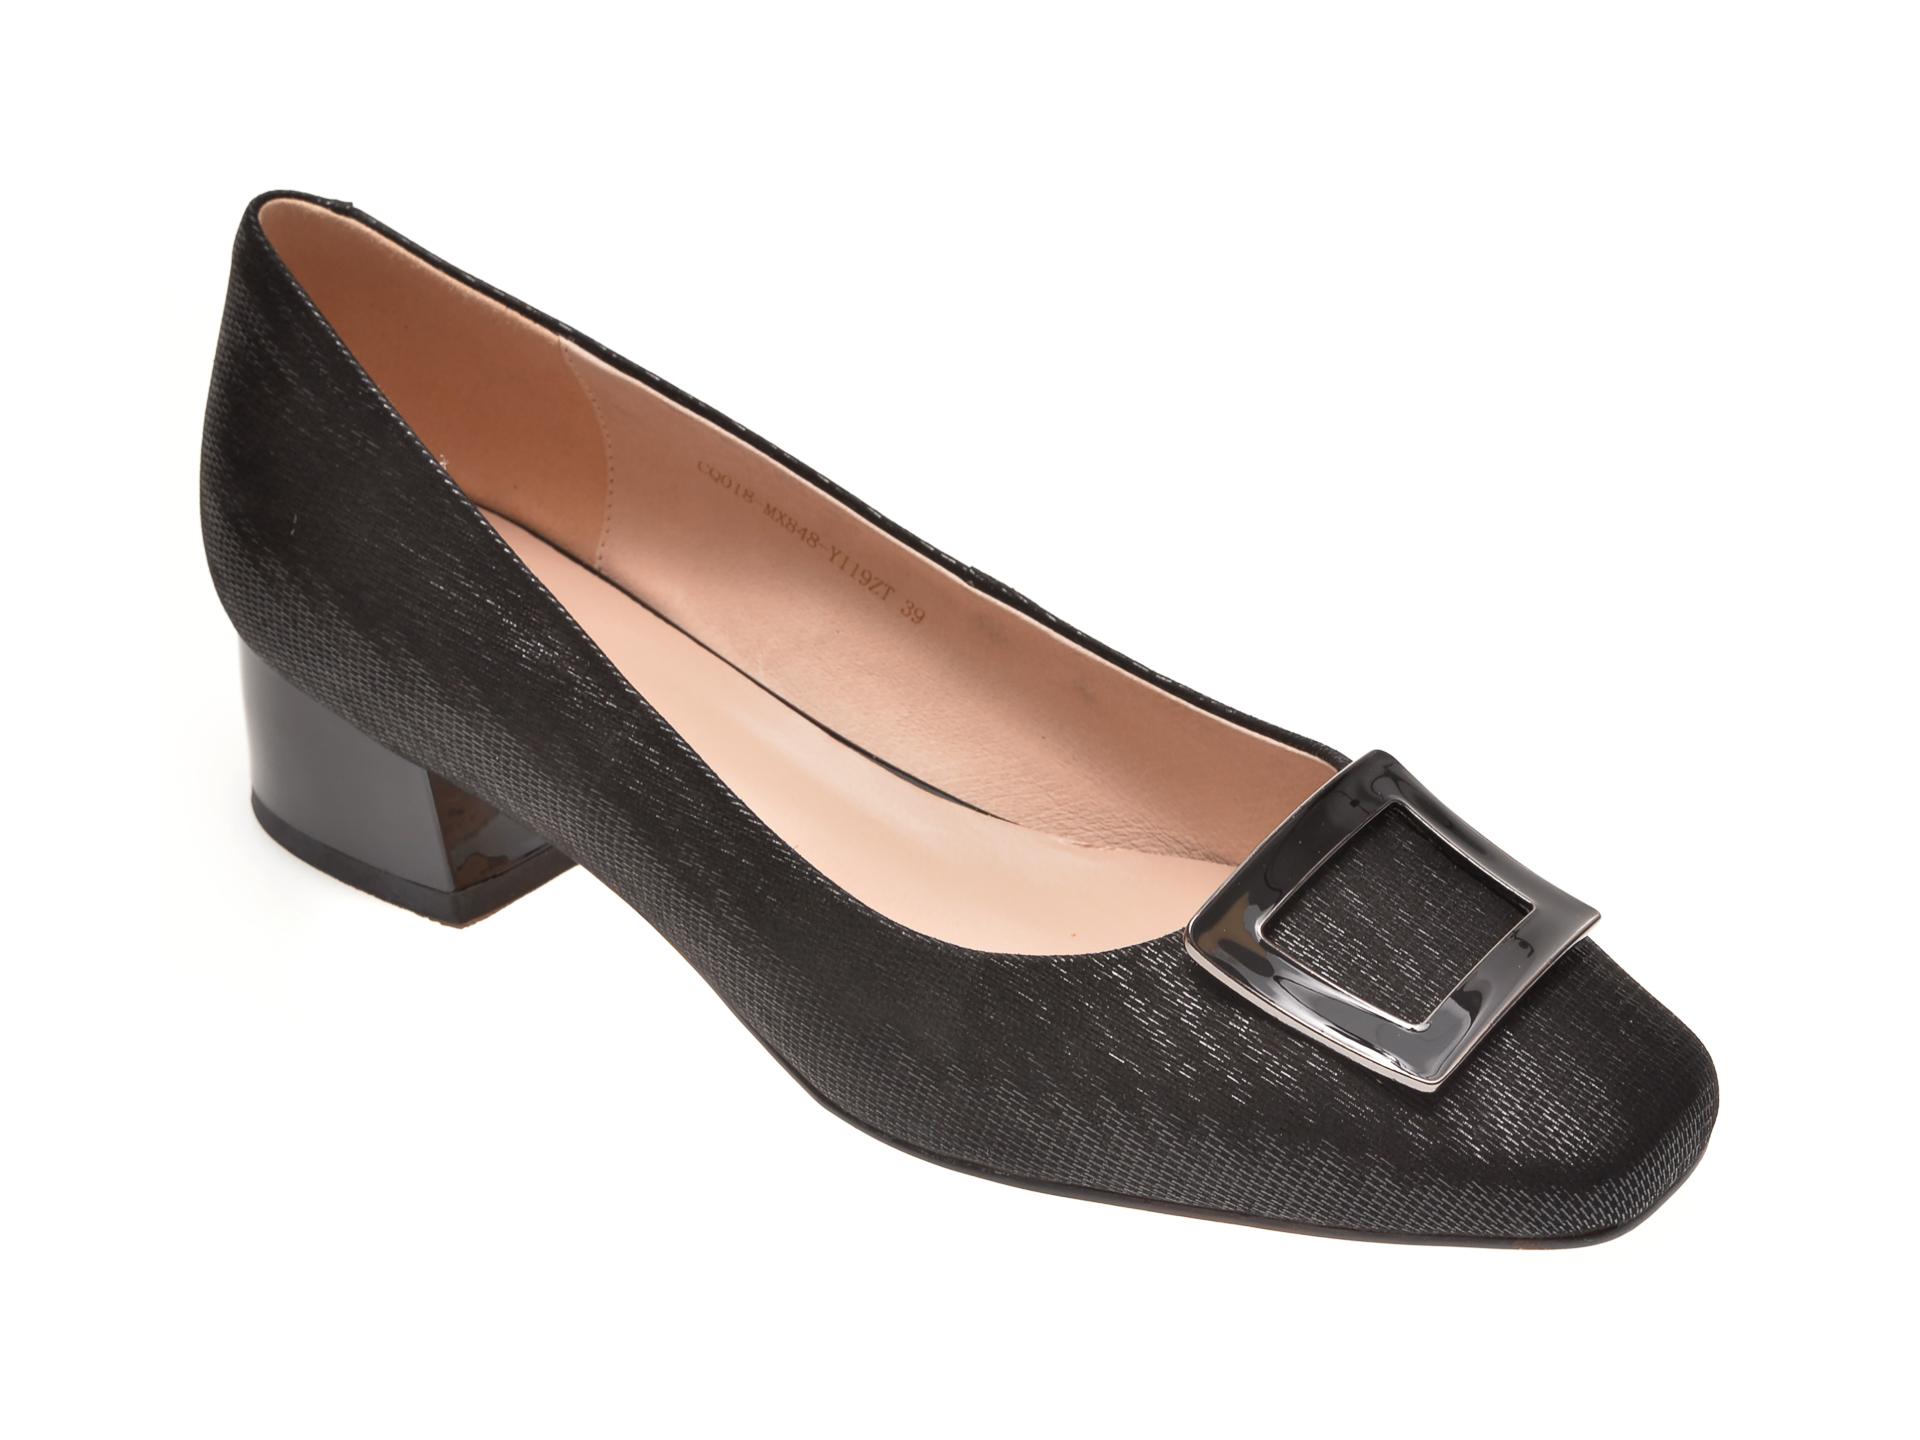 Pantofi EPICA negri, MX848, din piele naturala